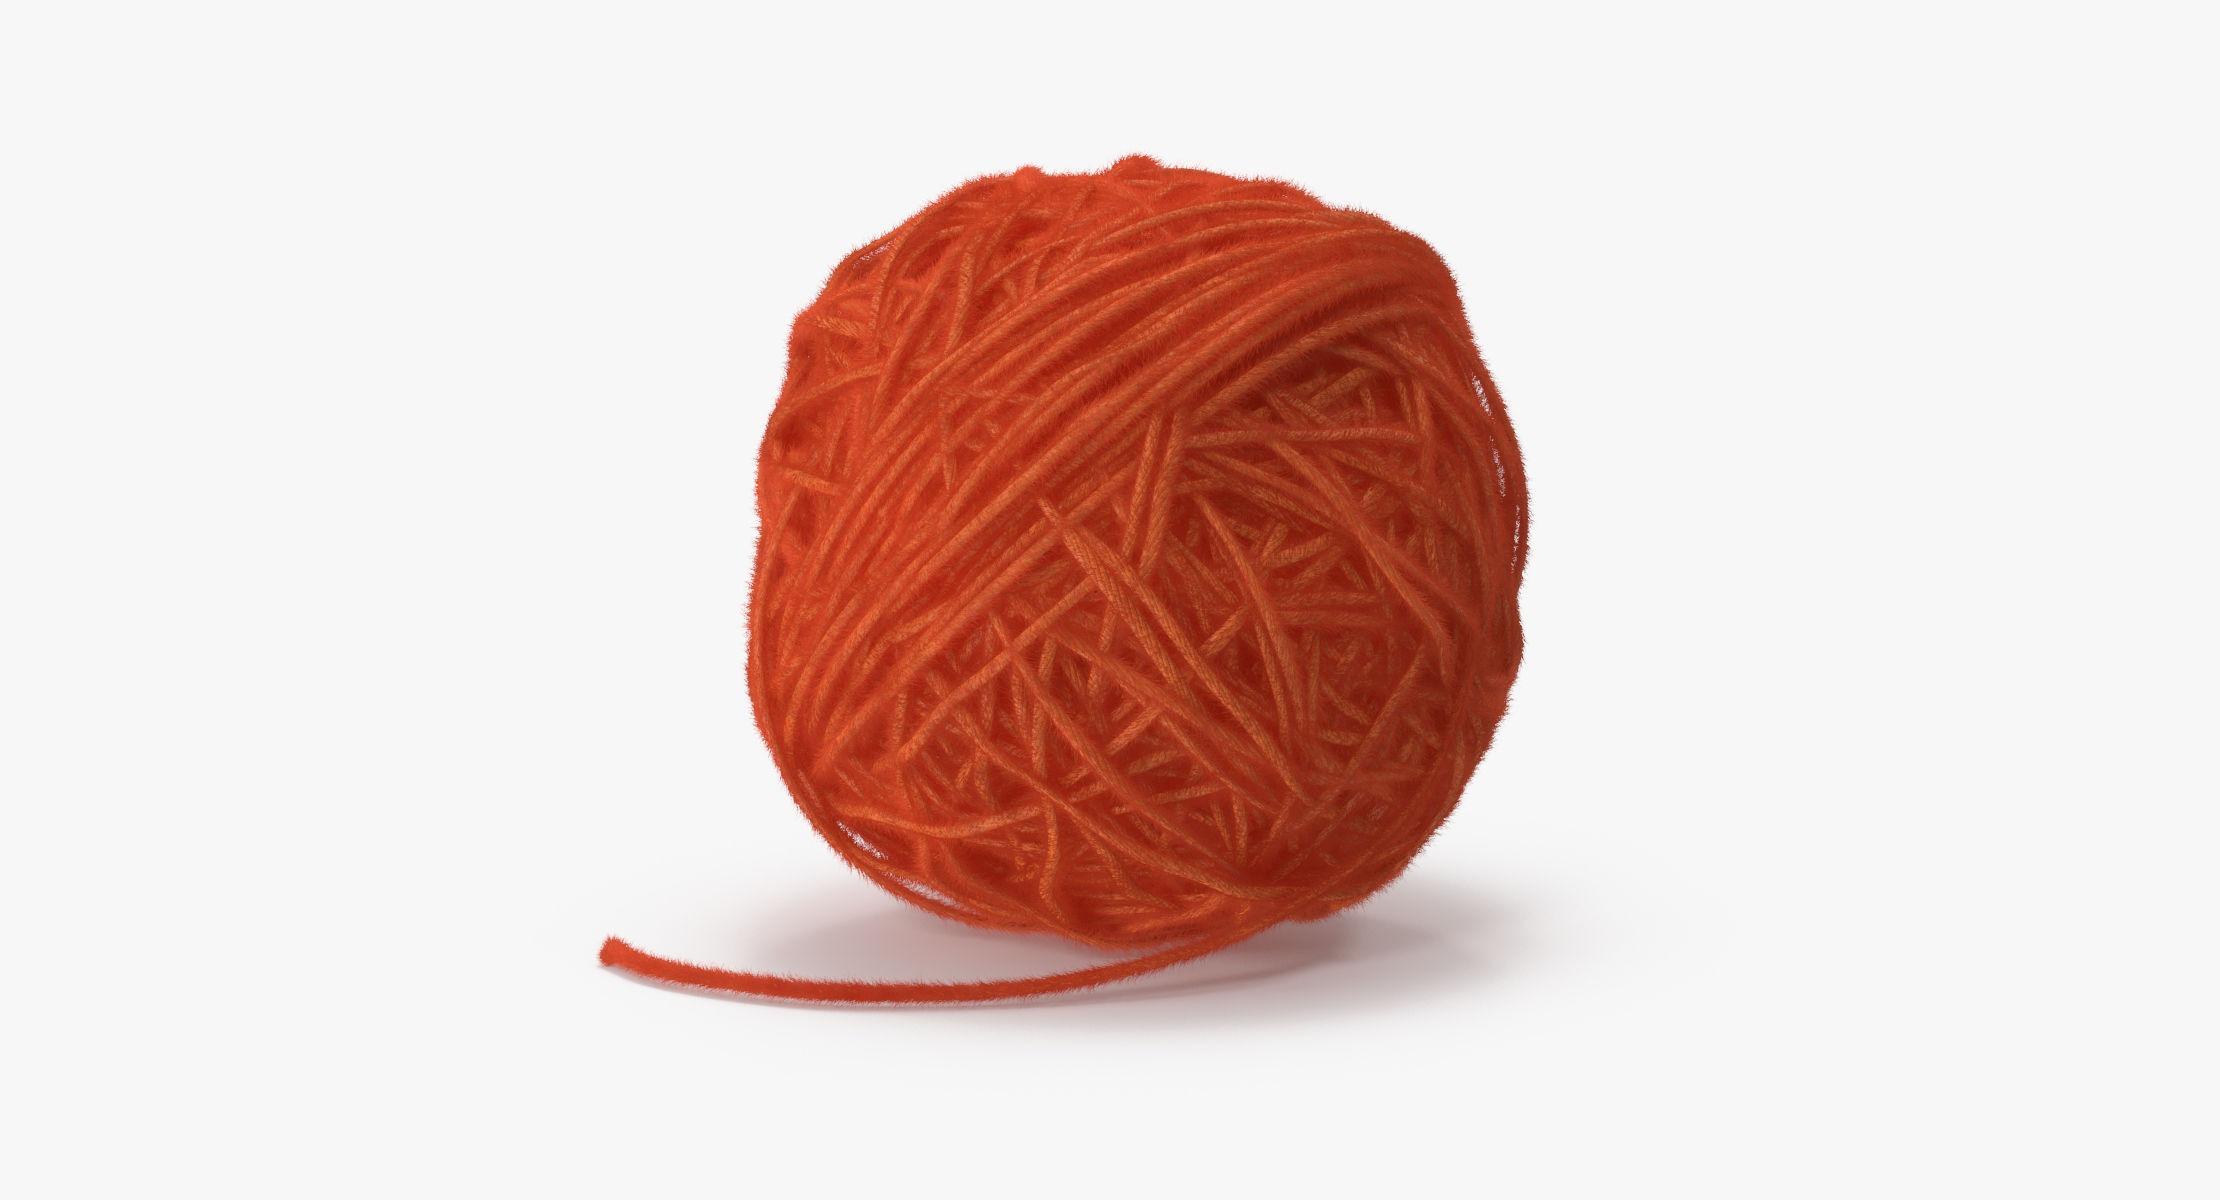 Ball of Yarn Orange - reel 1